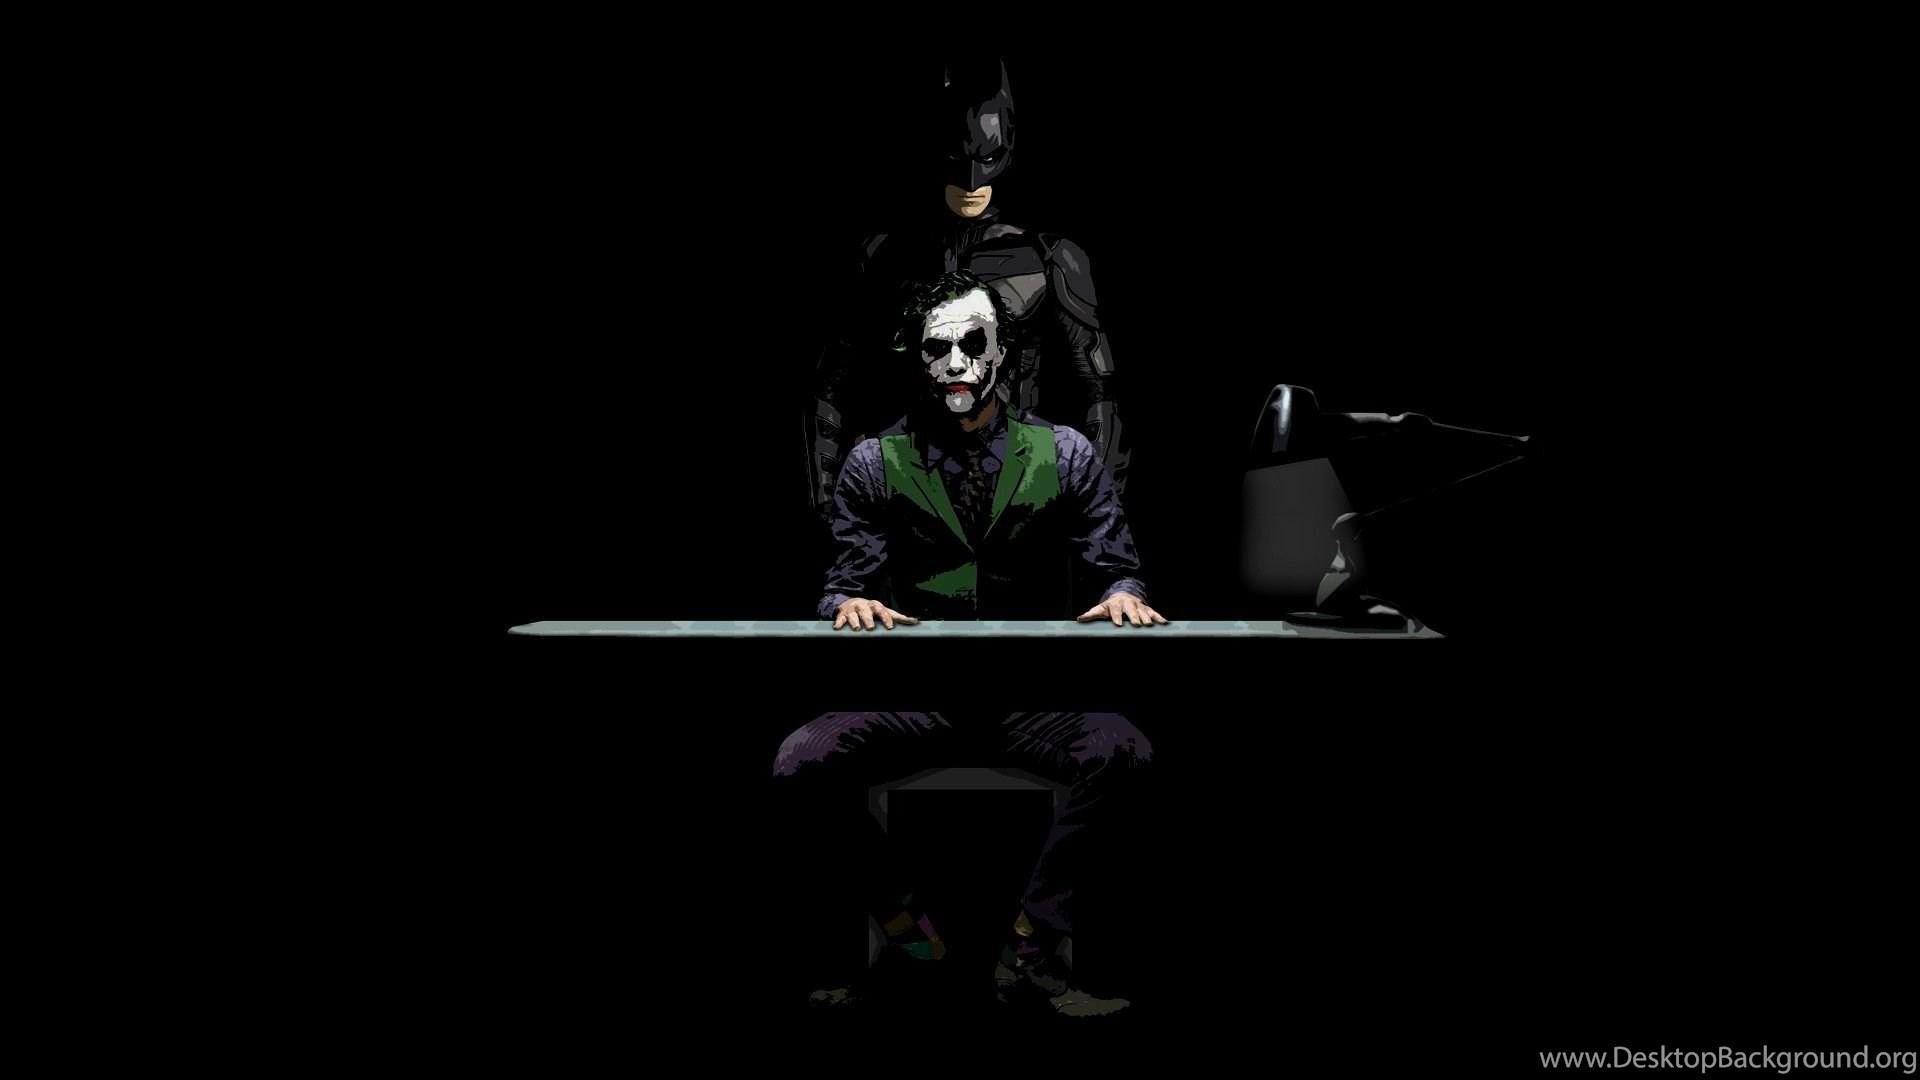 batman joker wallpapers dark knight – 1920×1080 high definition